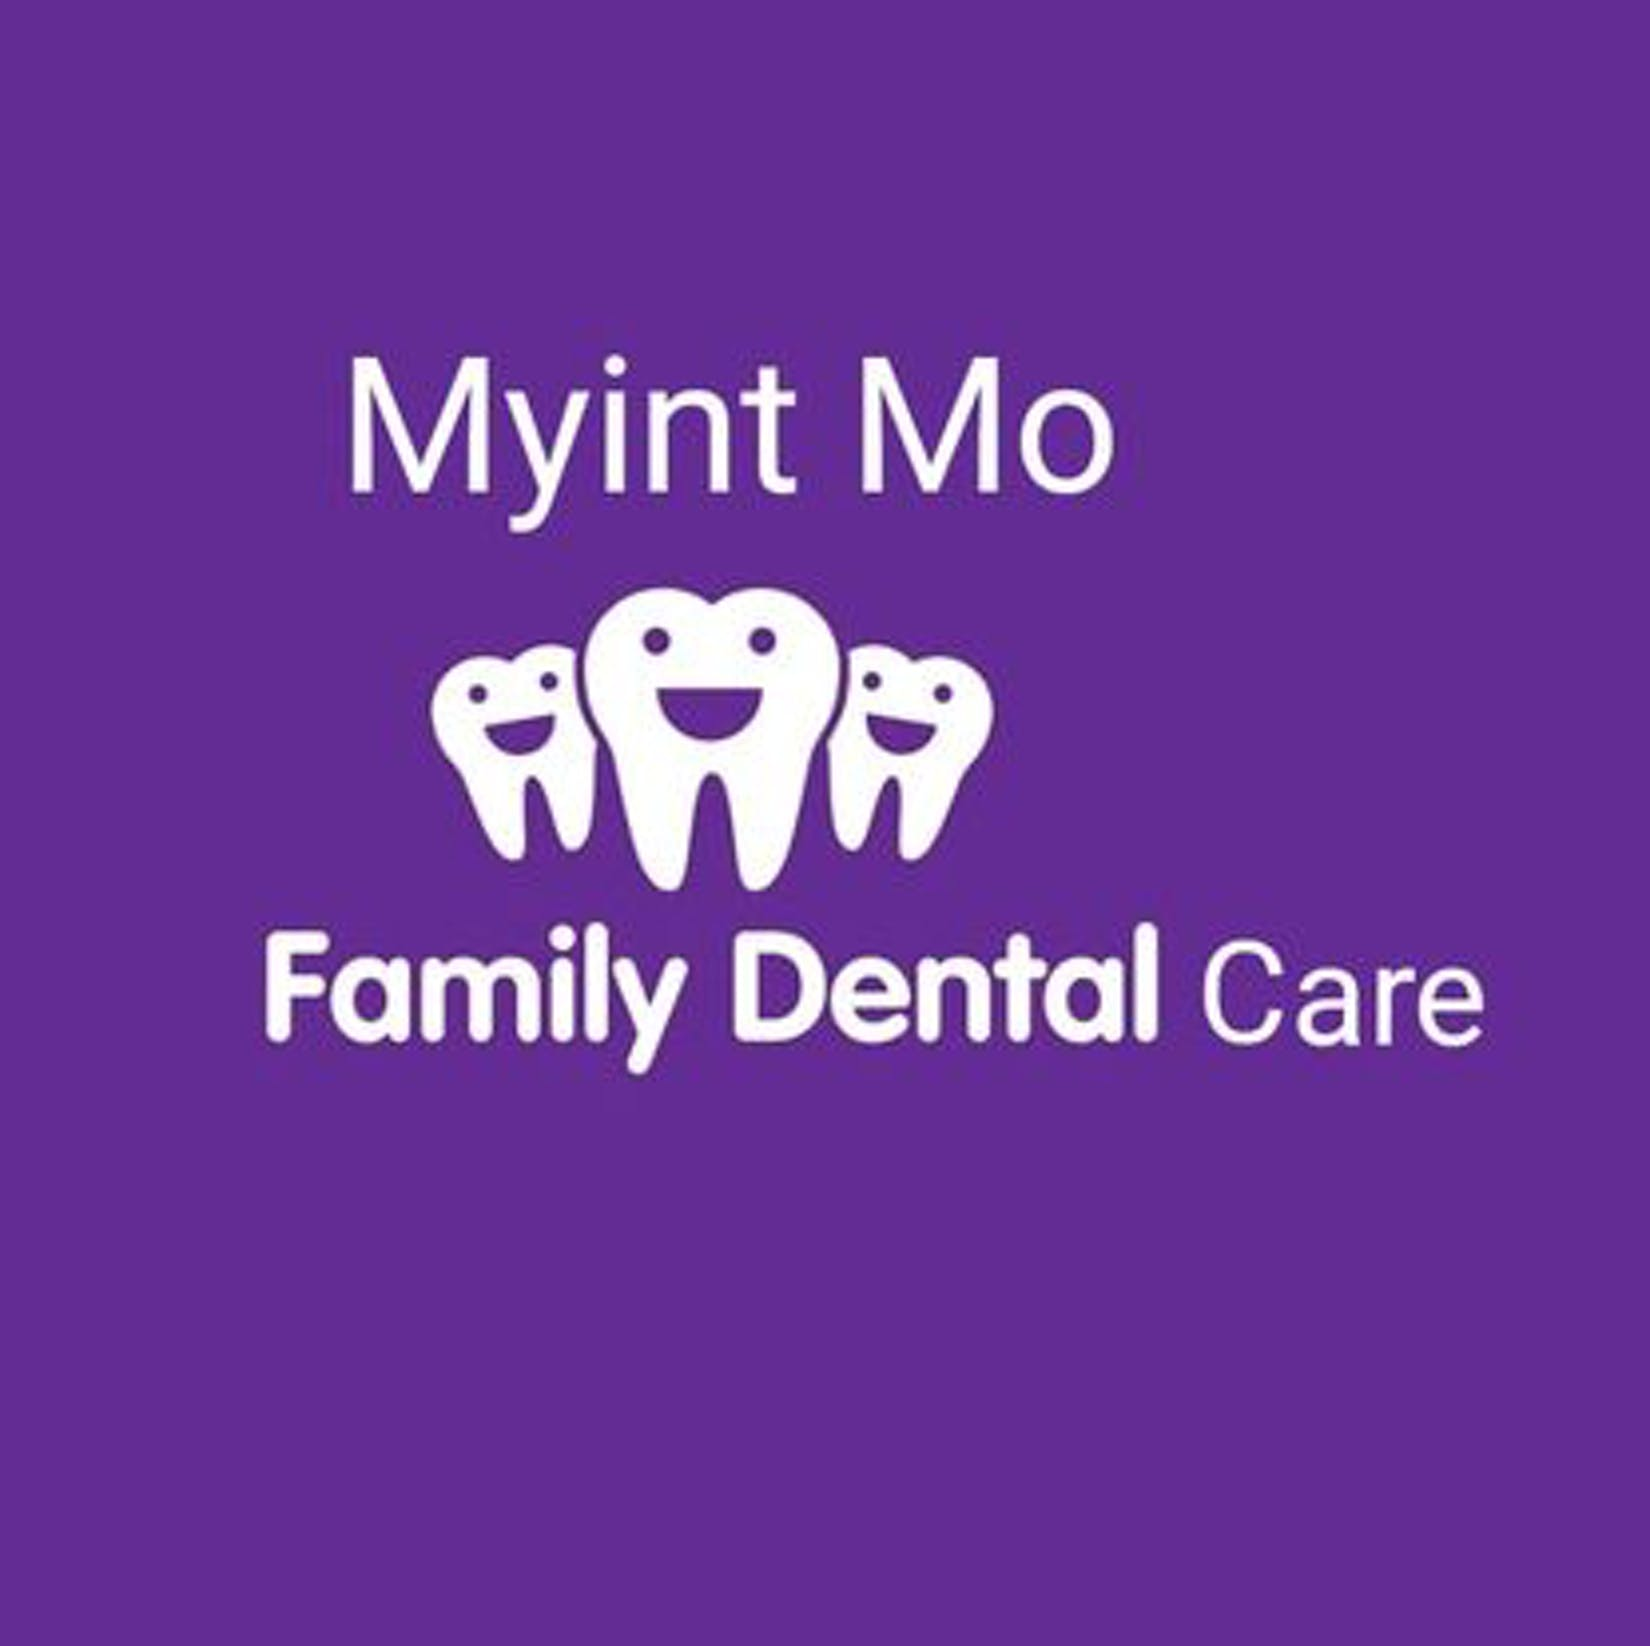 Myint Mo Dental Care | Medical